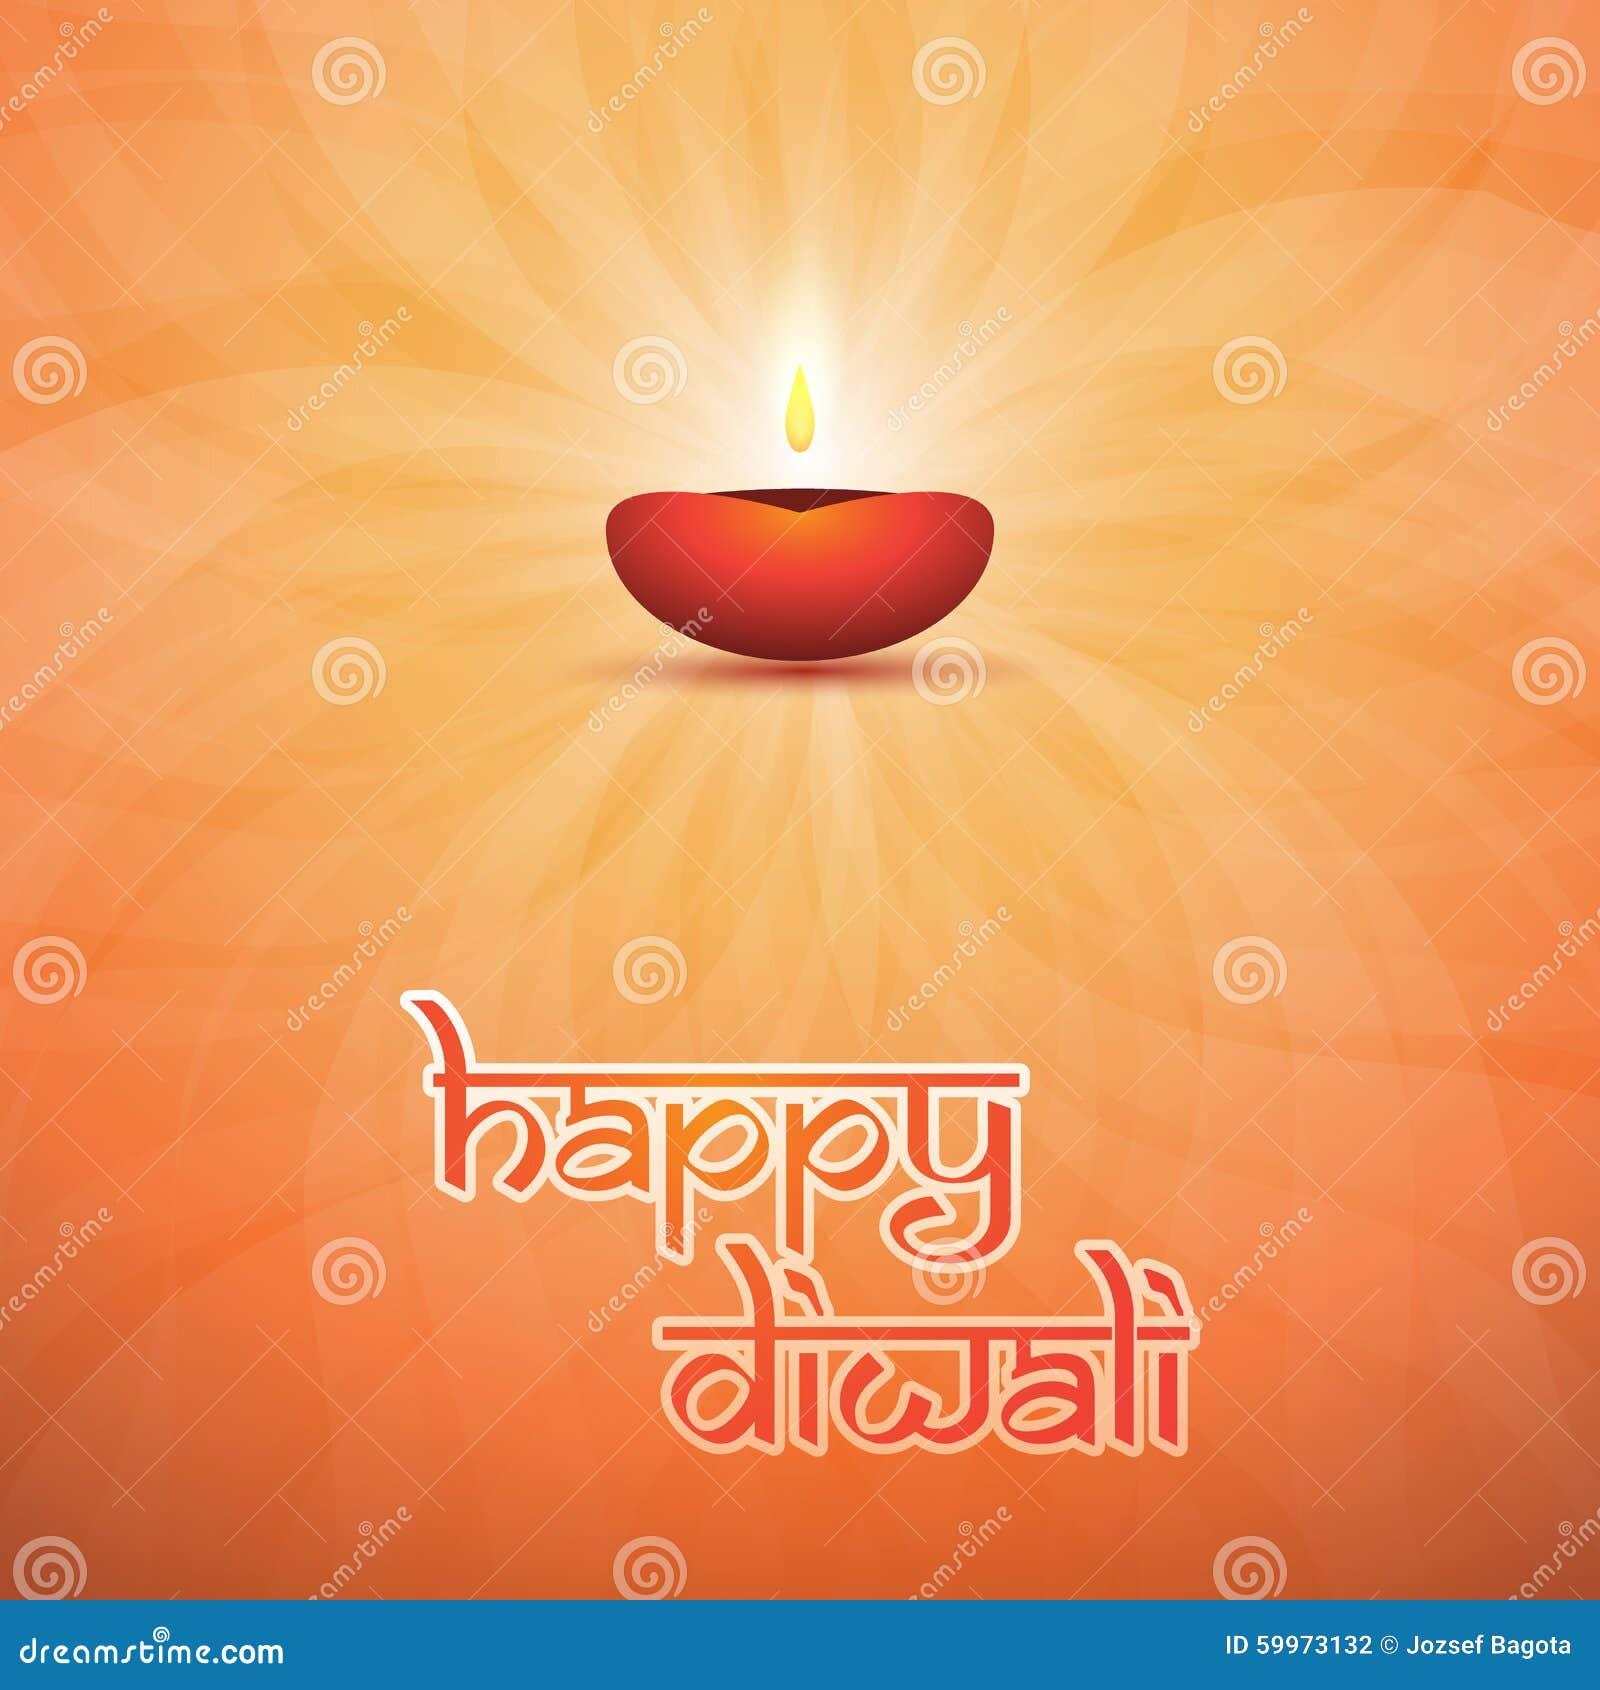 Happy Diwali Card Vector Background Illustration Stock Vector